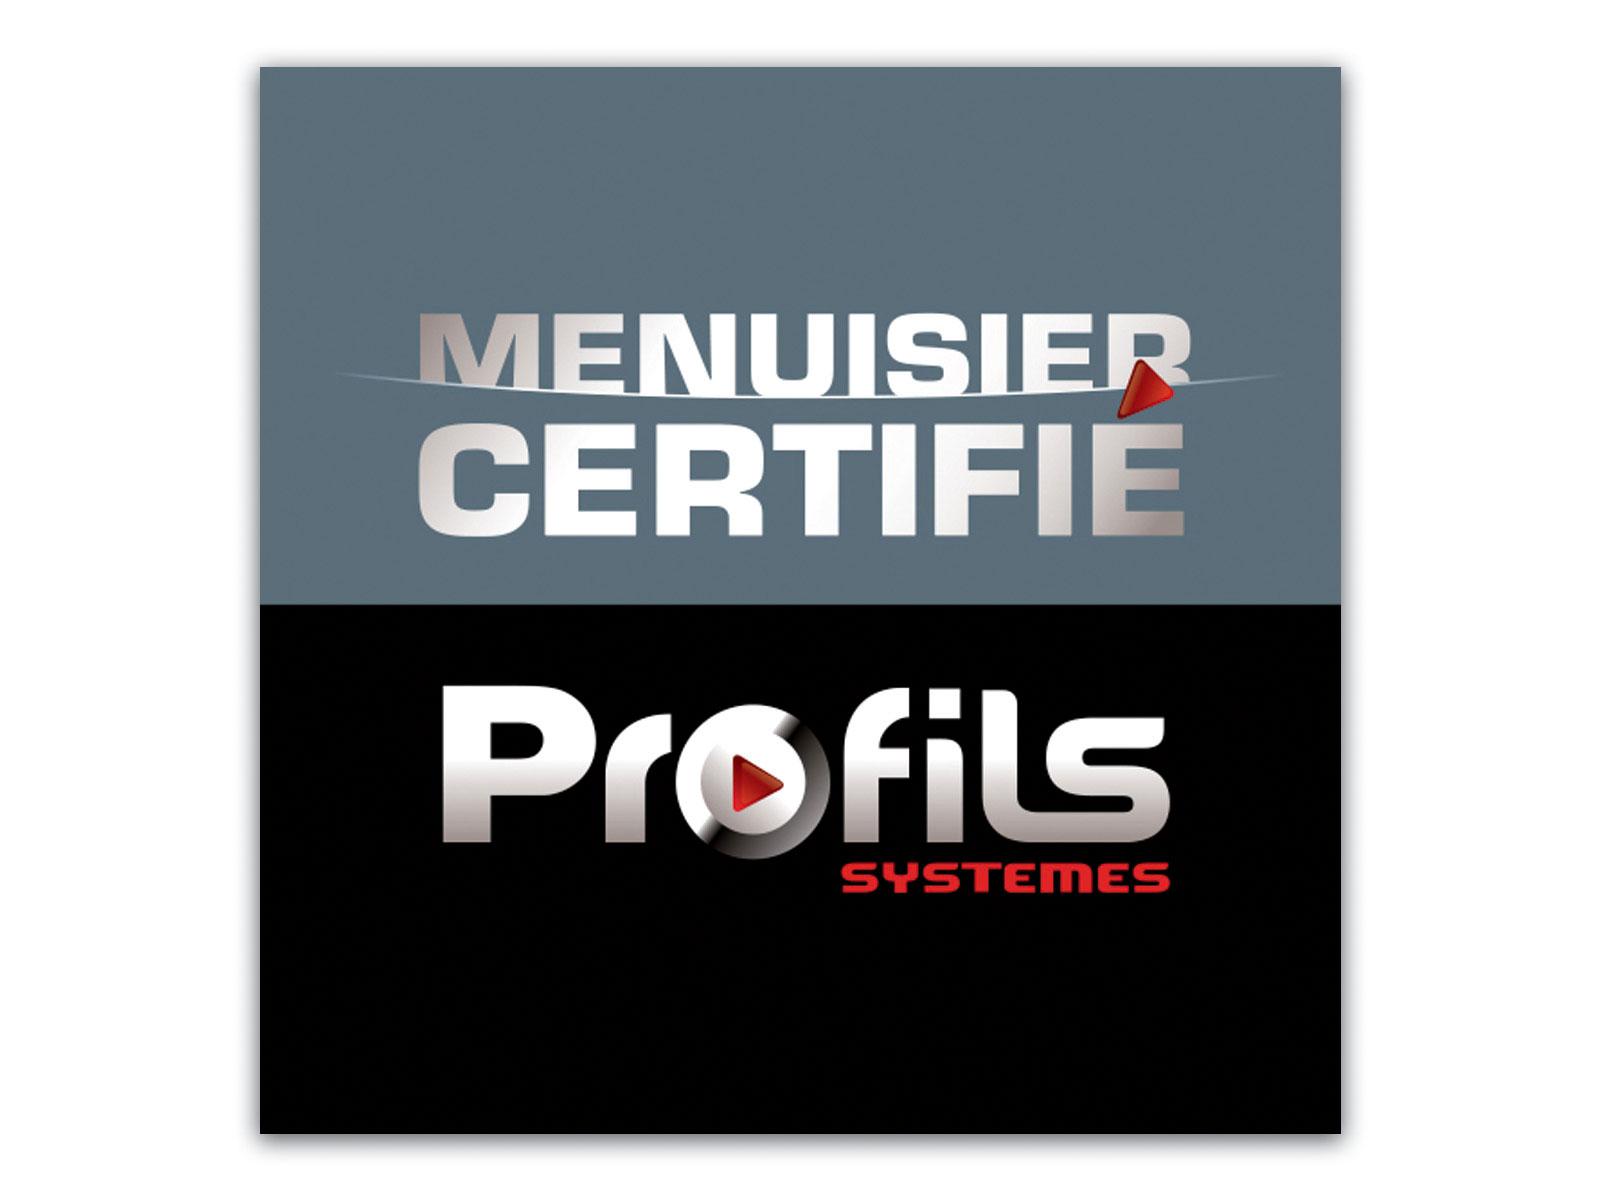 coladis meuisier certifie profils systemes logo